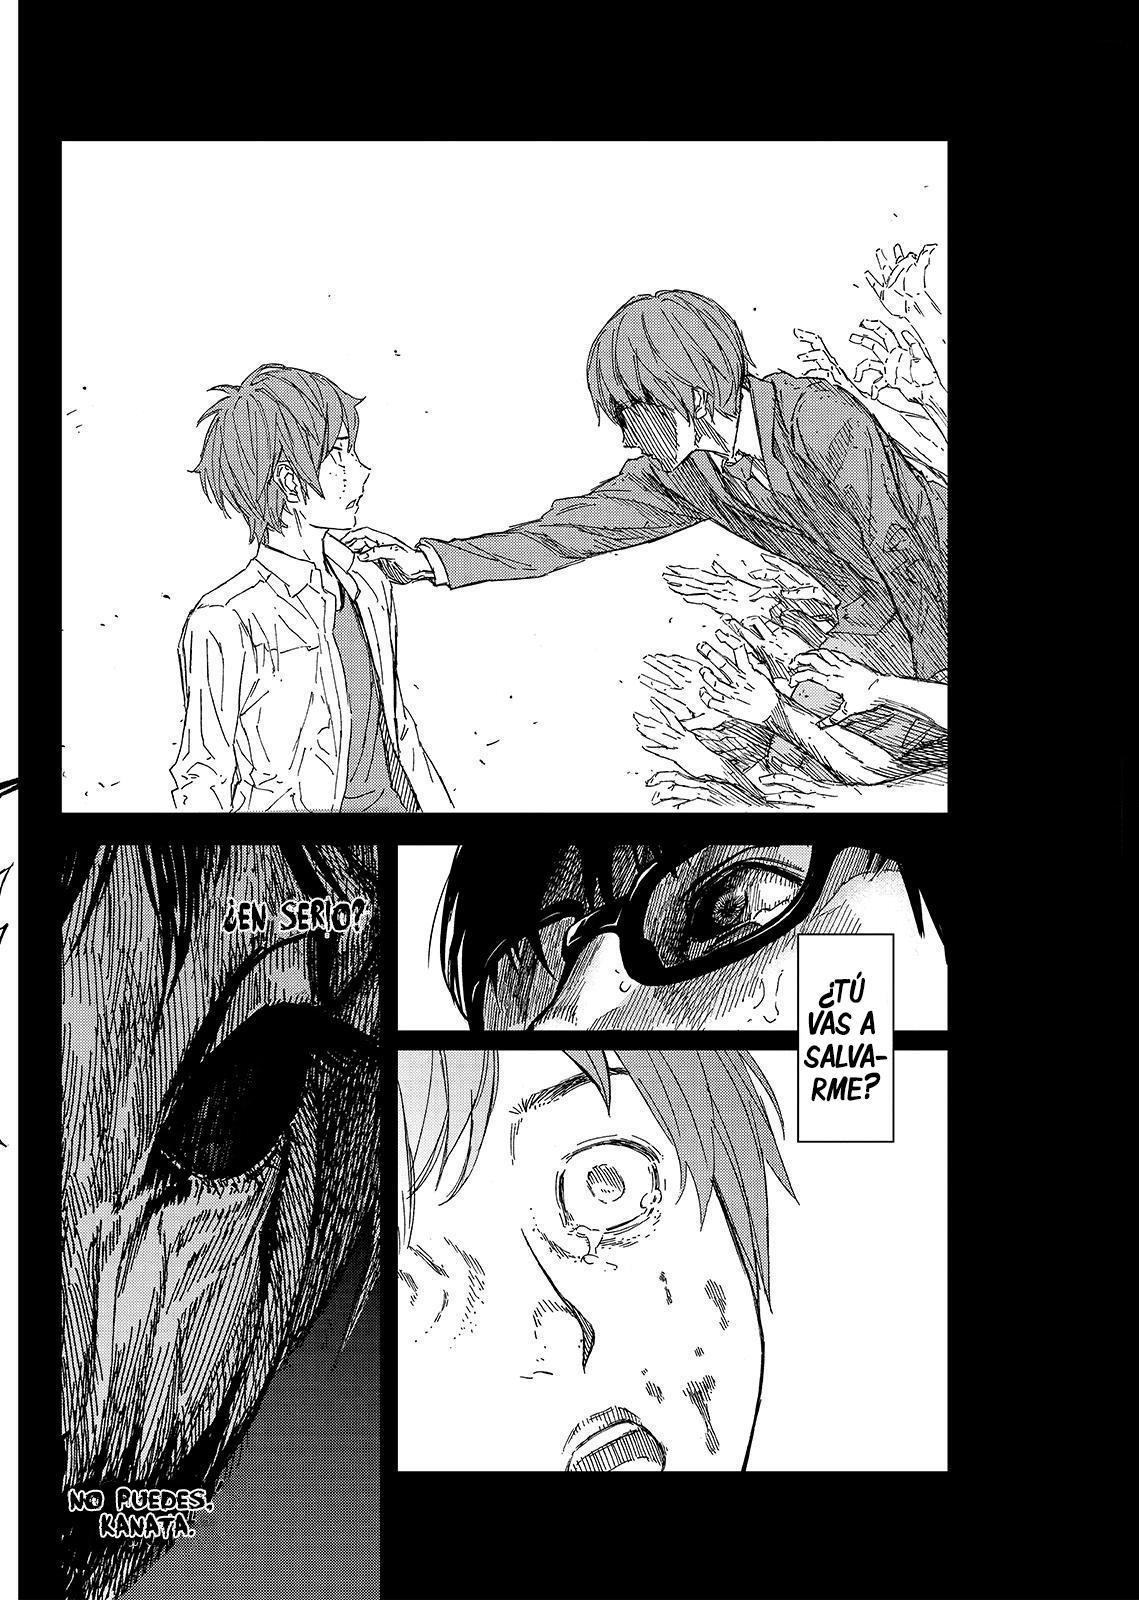 http://c5.ninemanga.com/es_manga/54/16310/449597/91438c26aba5f20778fdc4996c198795.jpg Page 3